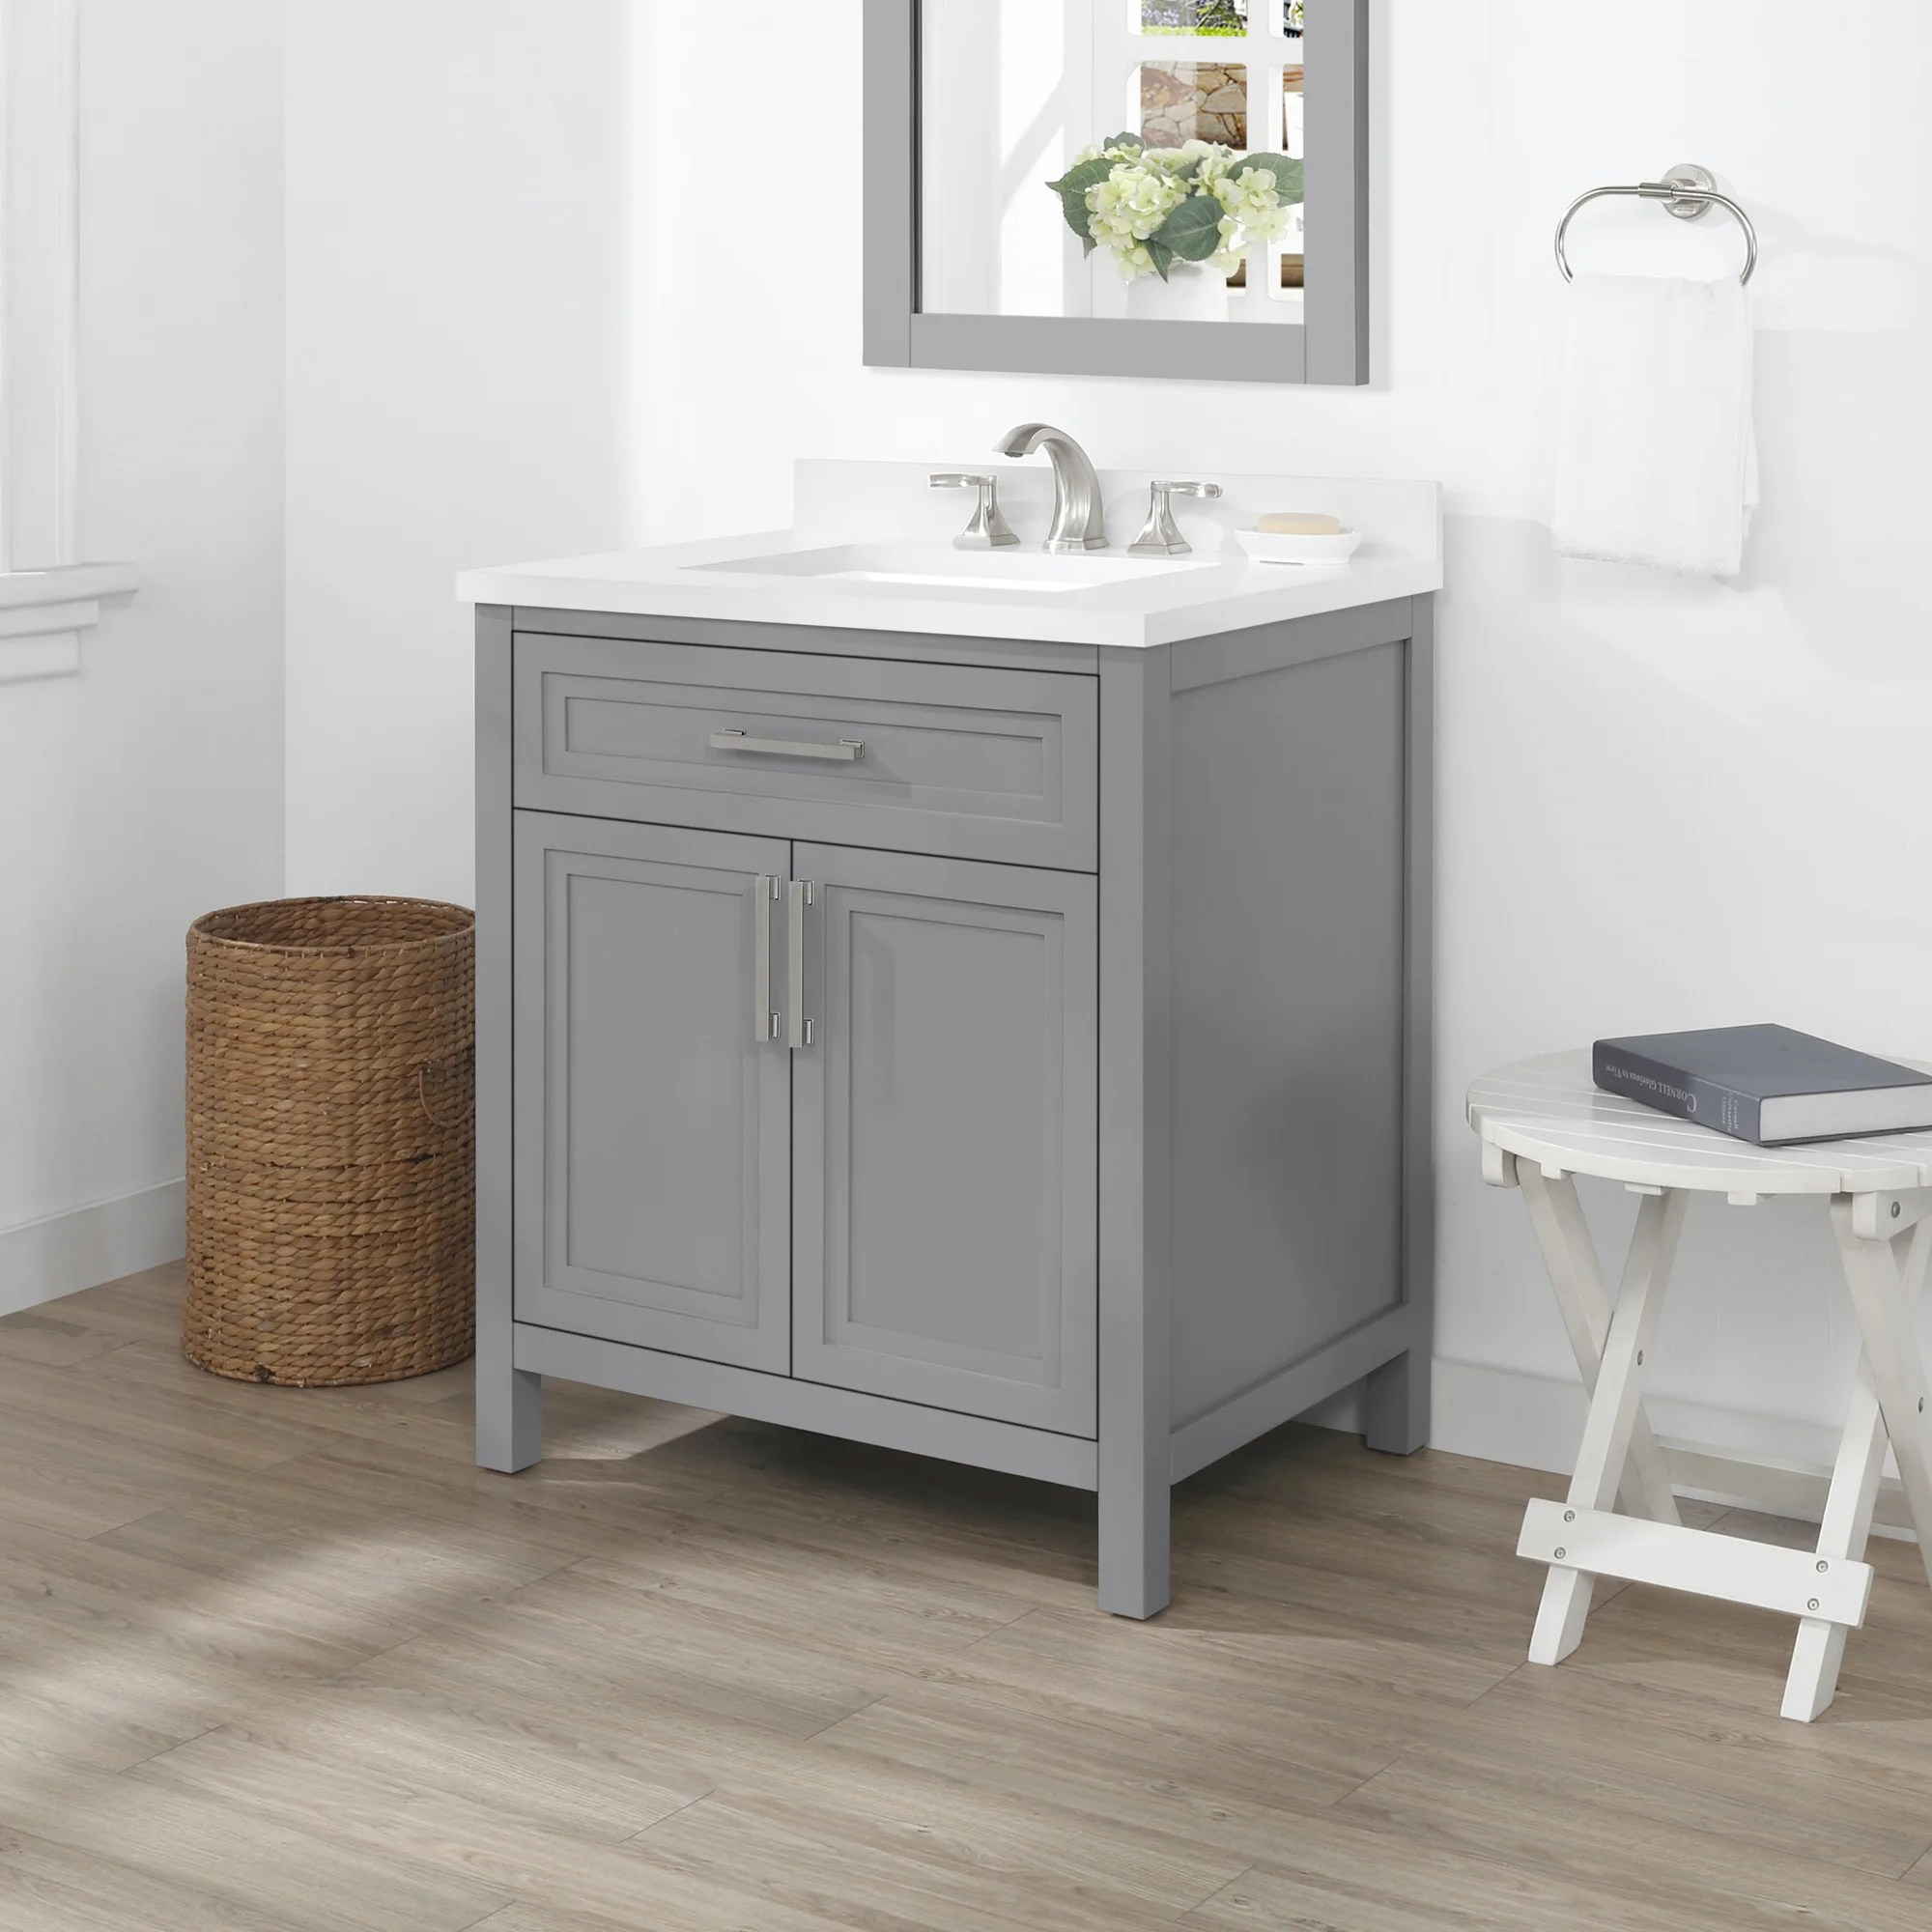 ove decors laney 30 in single sink bathroom vanity in american grey